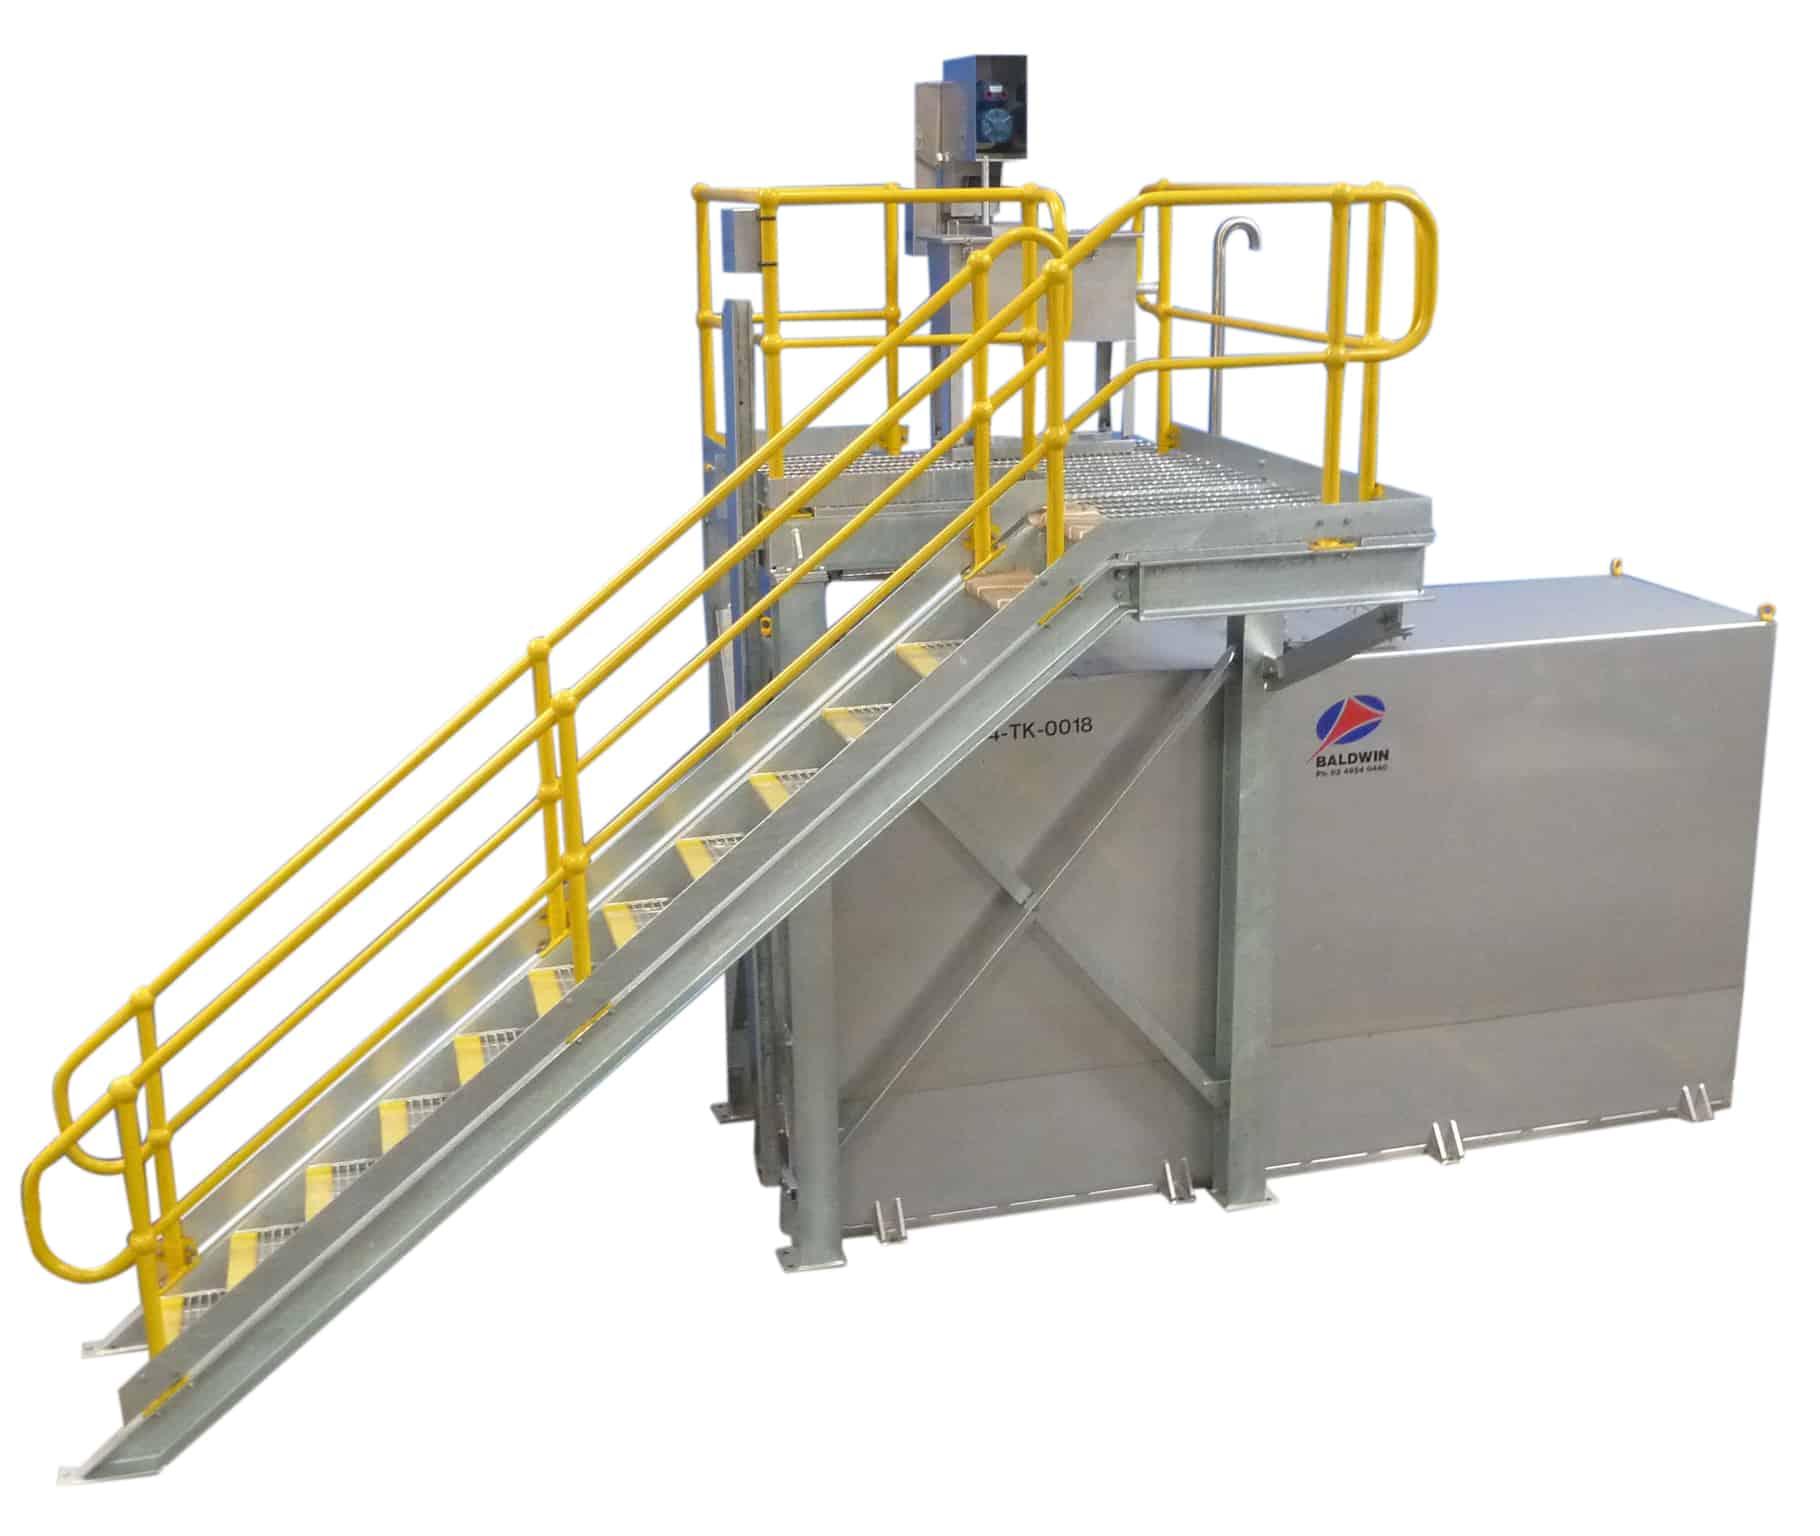 baldwin industrial systems, modular, custom process systems